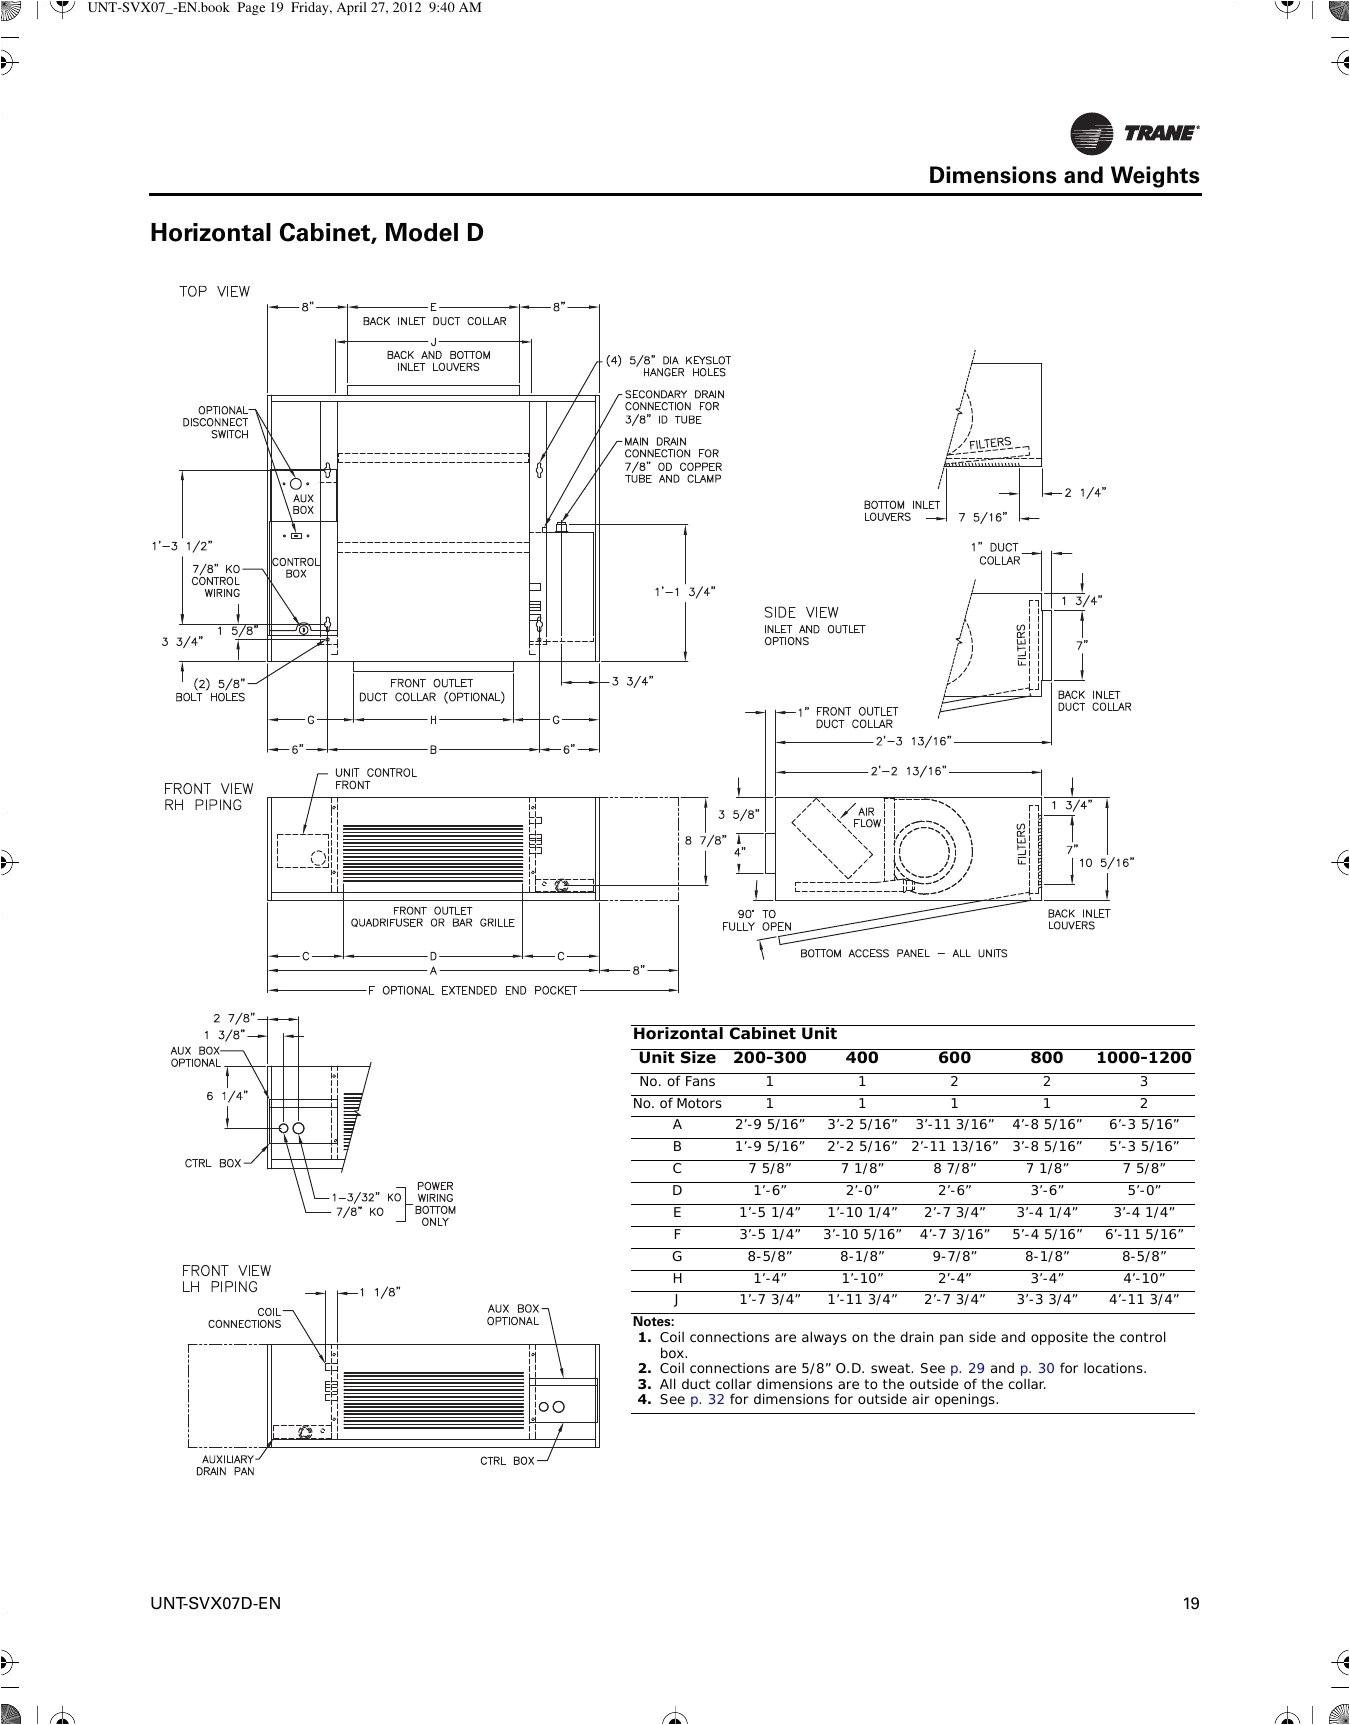 Janitrol Heat Pump Wiring Diagram Janitrol Wiring Diagram Wiring Diagram Page